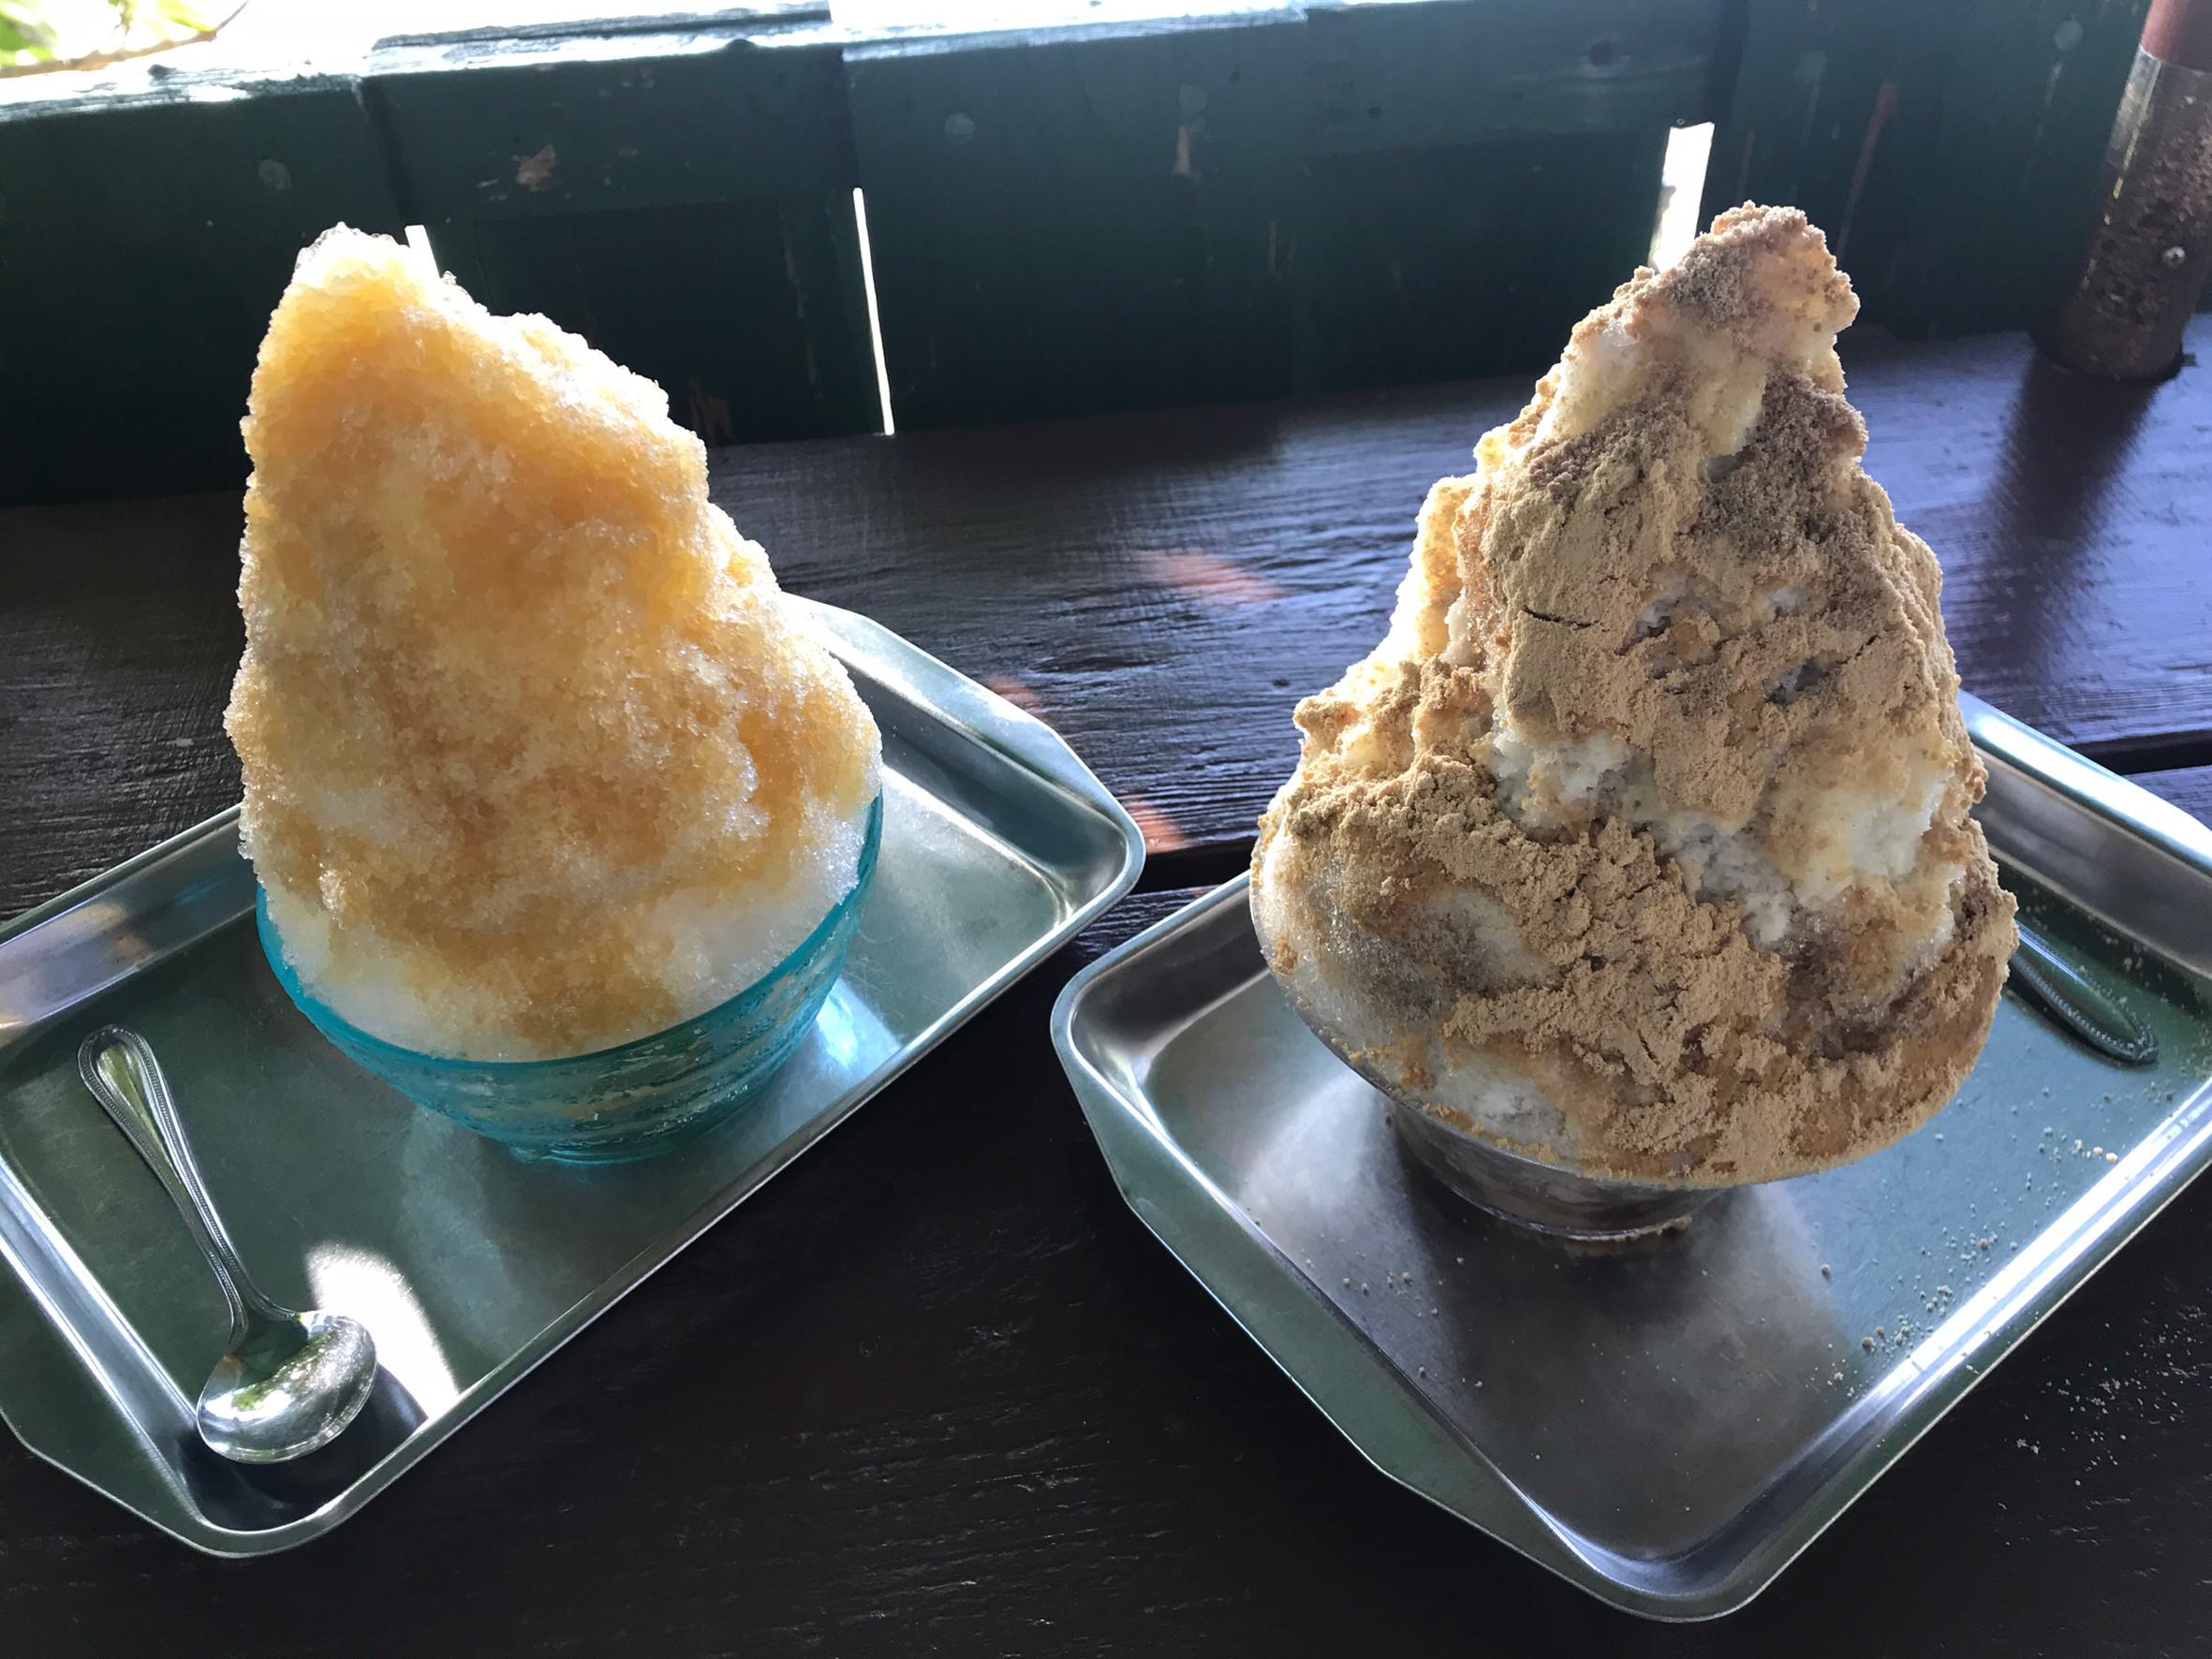 Minpika shaved ice